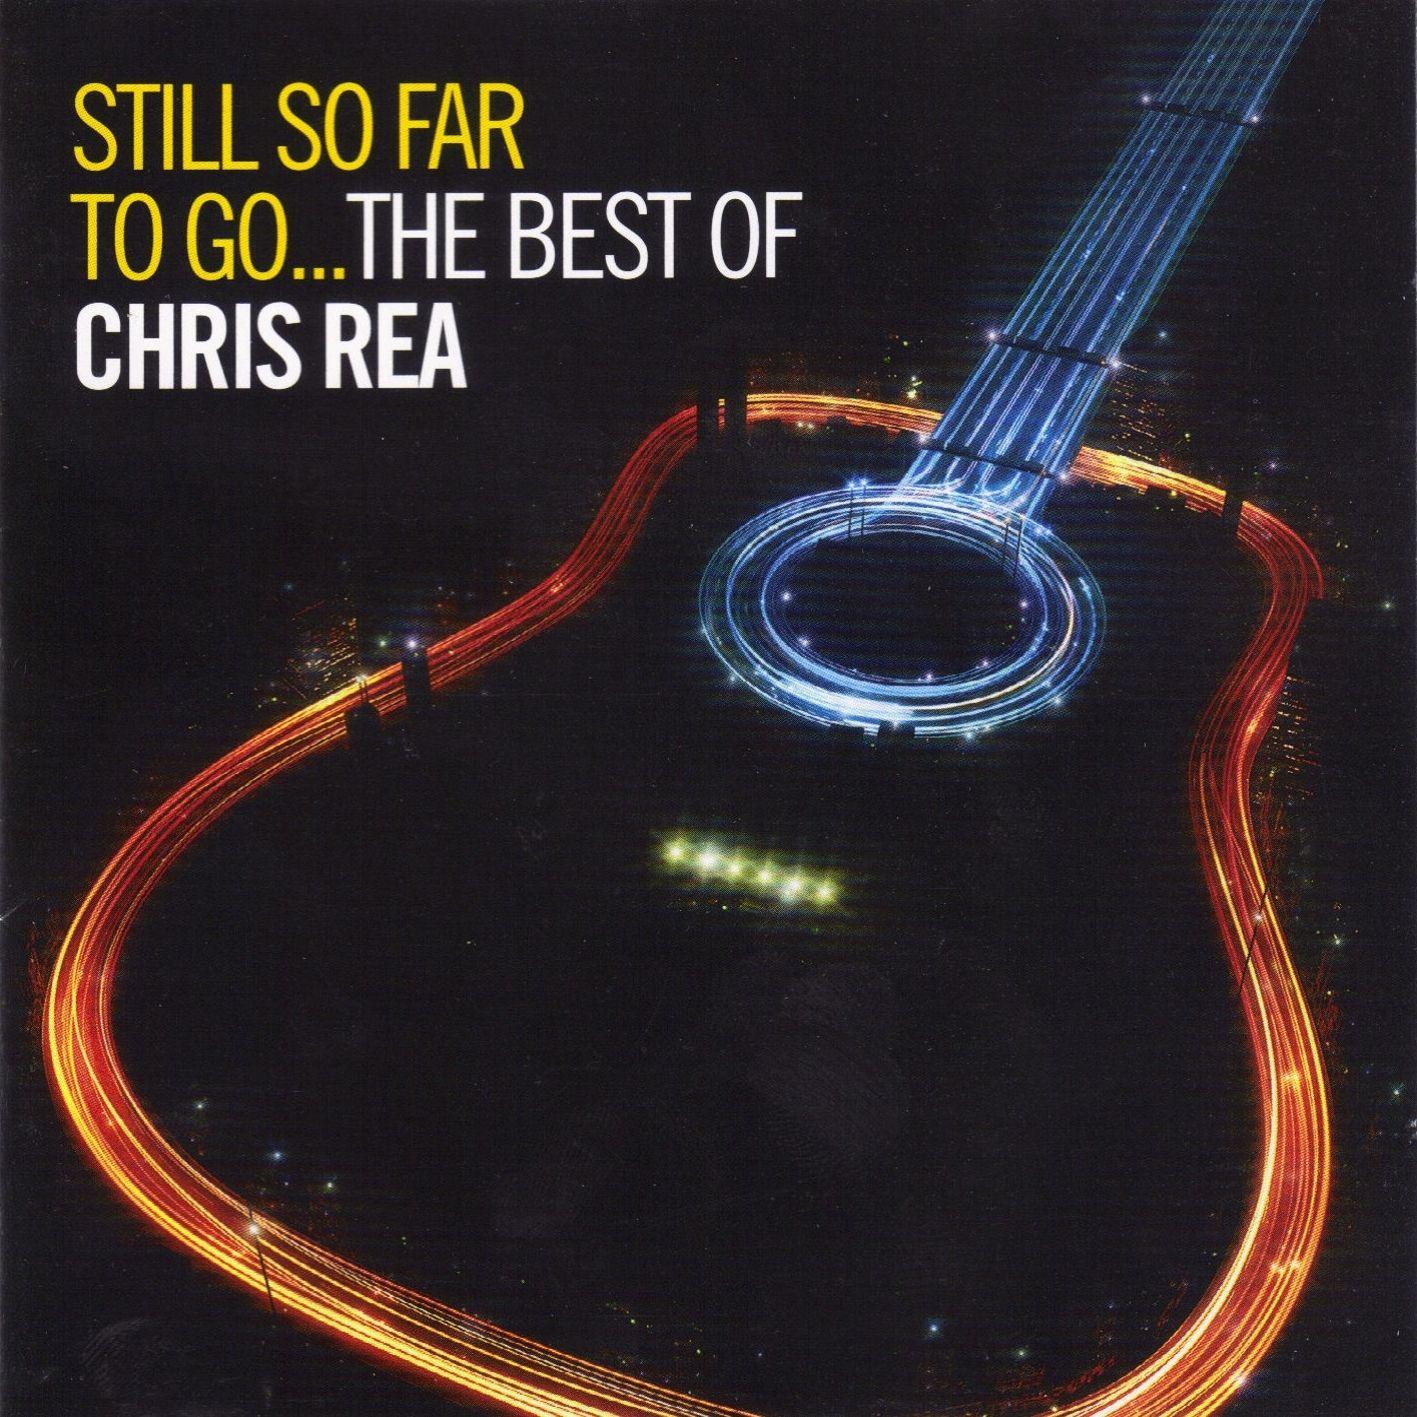 Chris Rea - Still So Far To Go - The Best Of album cover